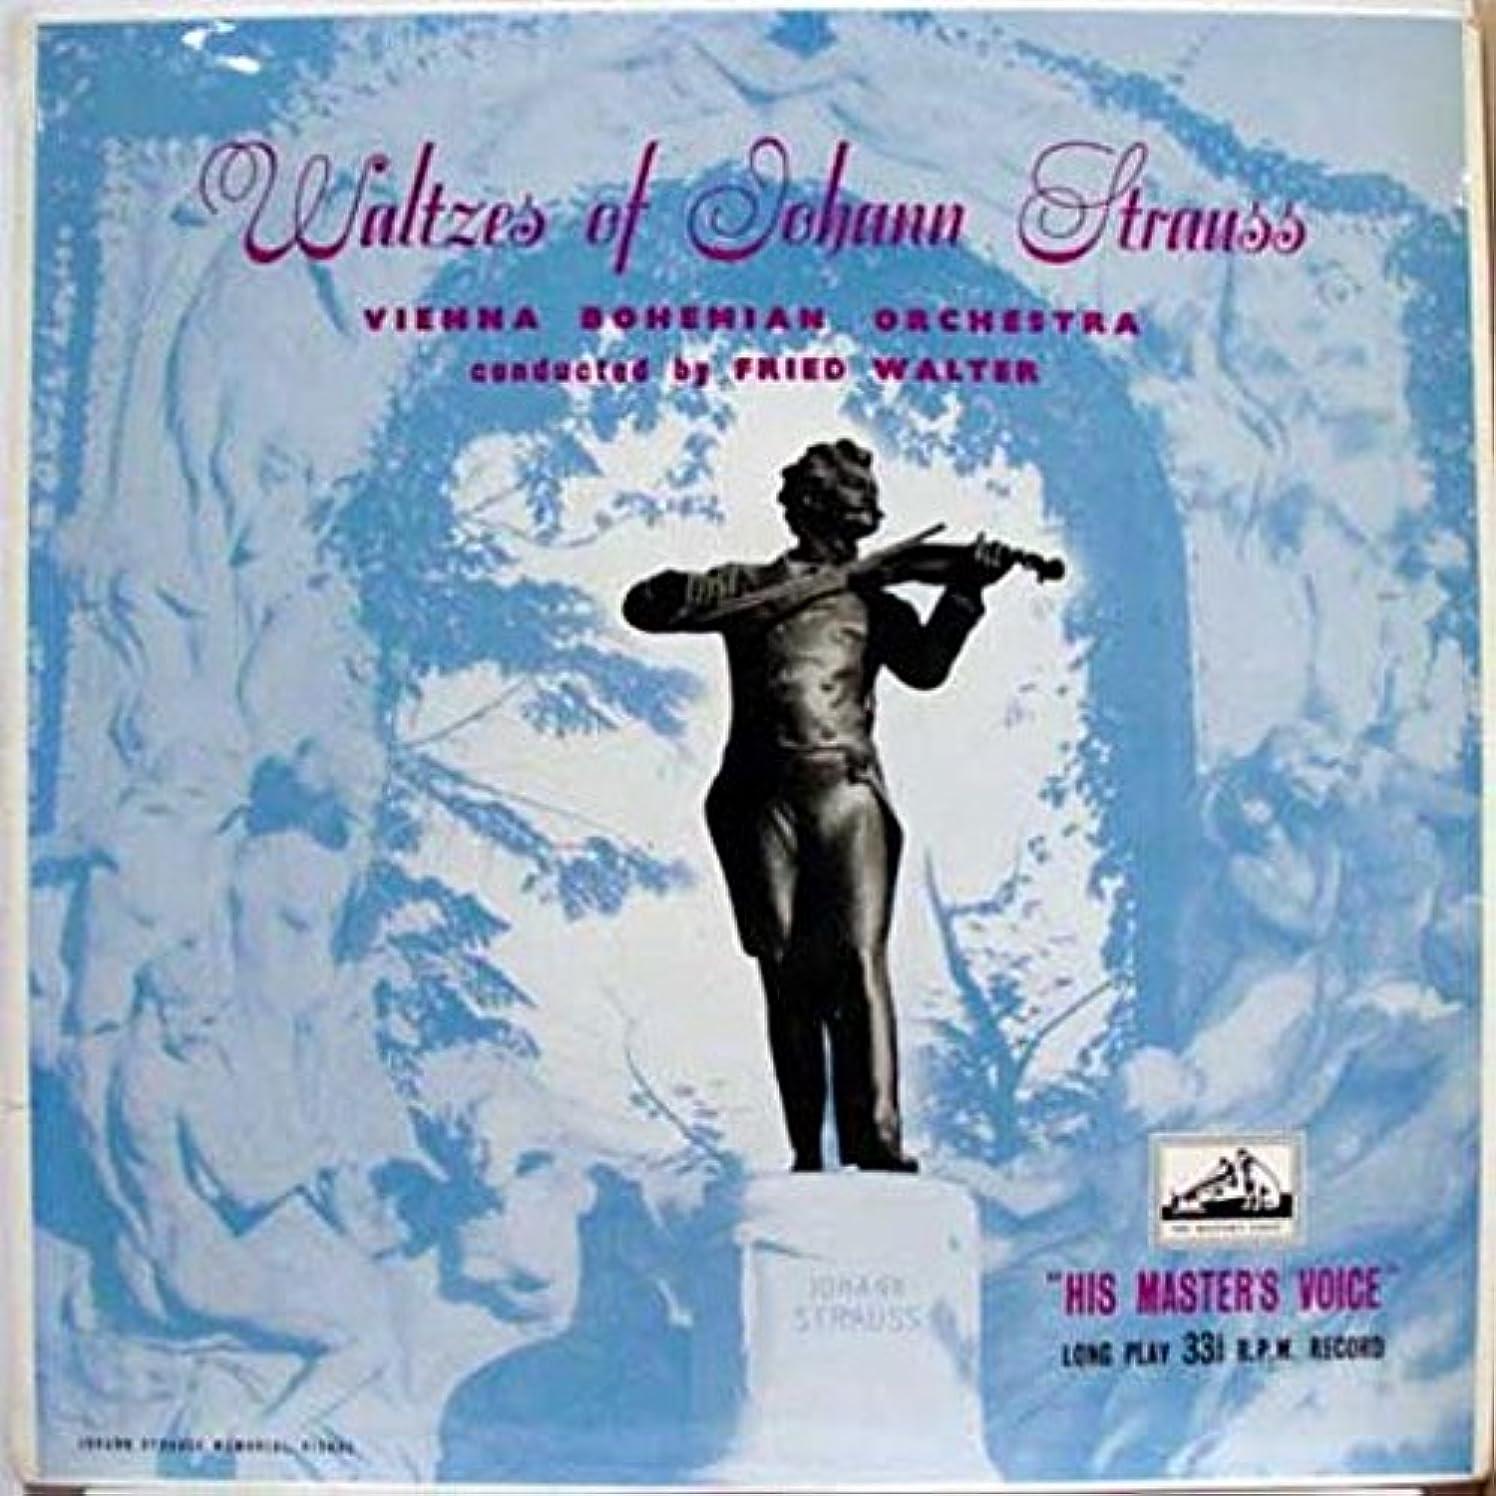 FRIED WALTER VIENNA BOHEMIAN ORCHESTRA WALTZES OF JOHAN STRAUSS vinyl record